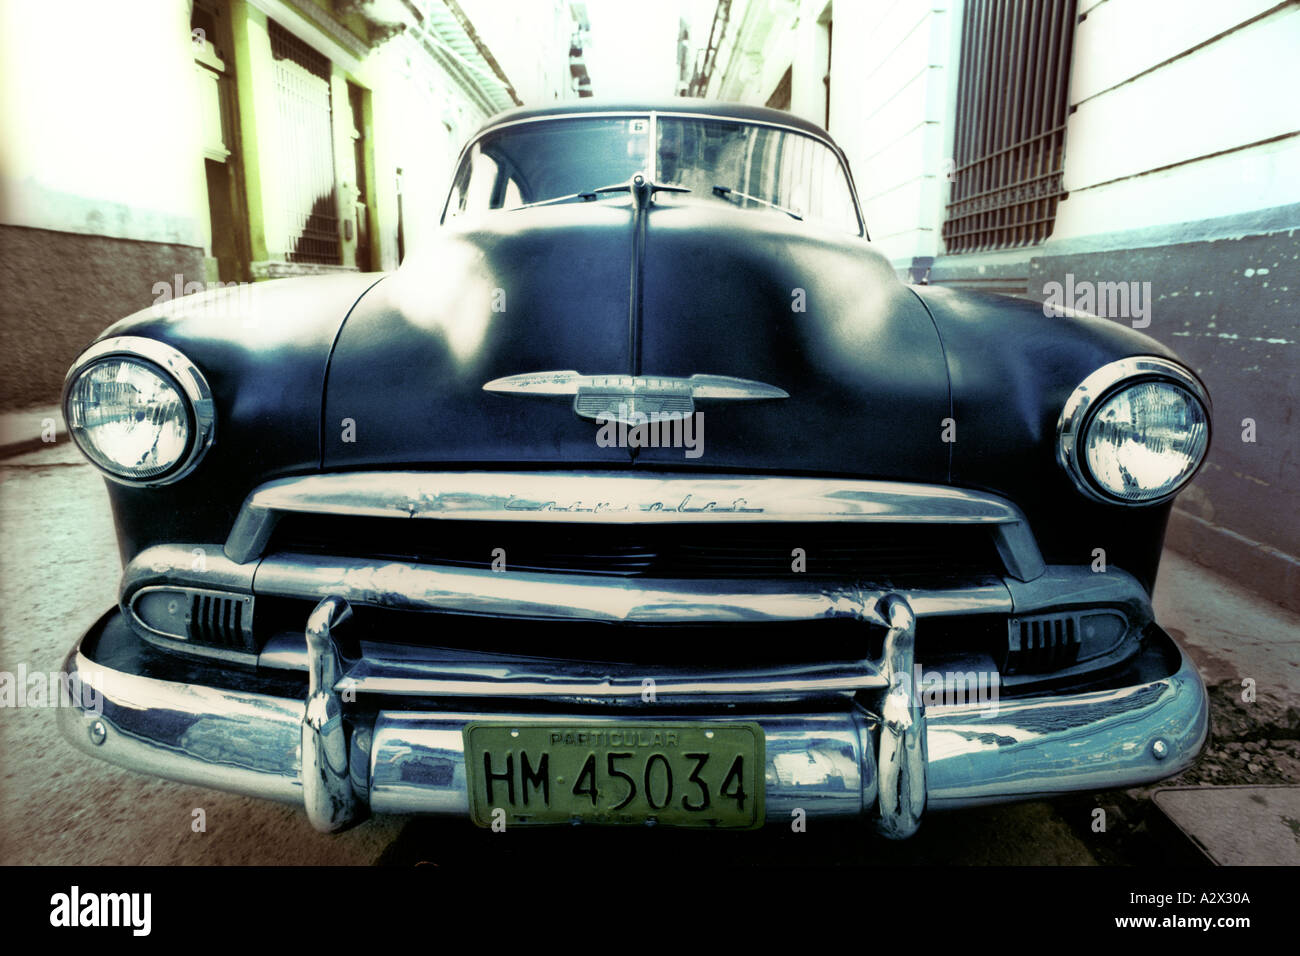 Old 50s Chevrolet car in Havana Cuba Stock Photo: 1975049 - Alamy